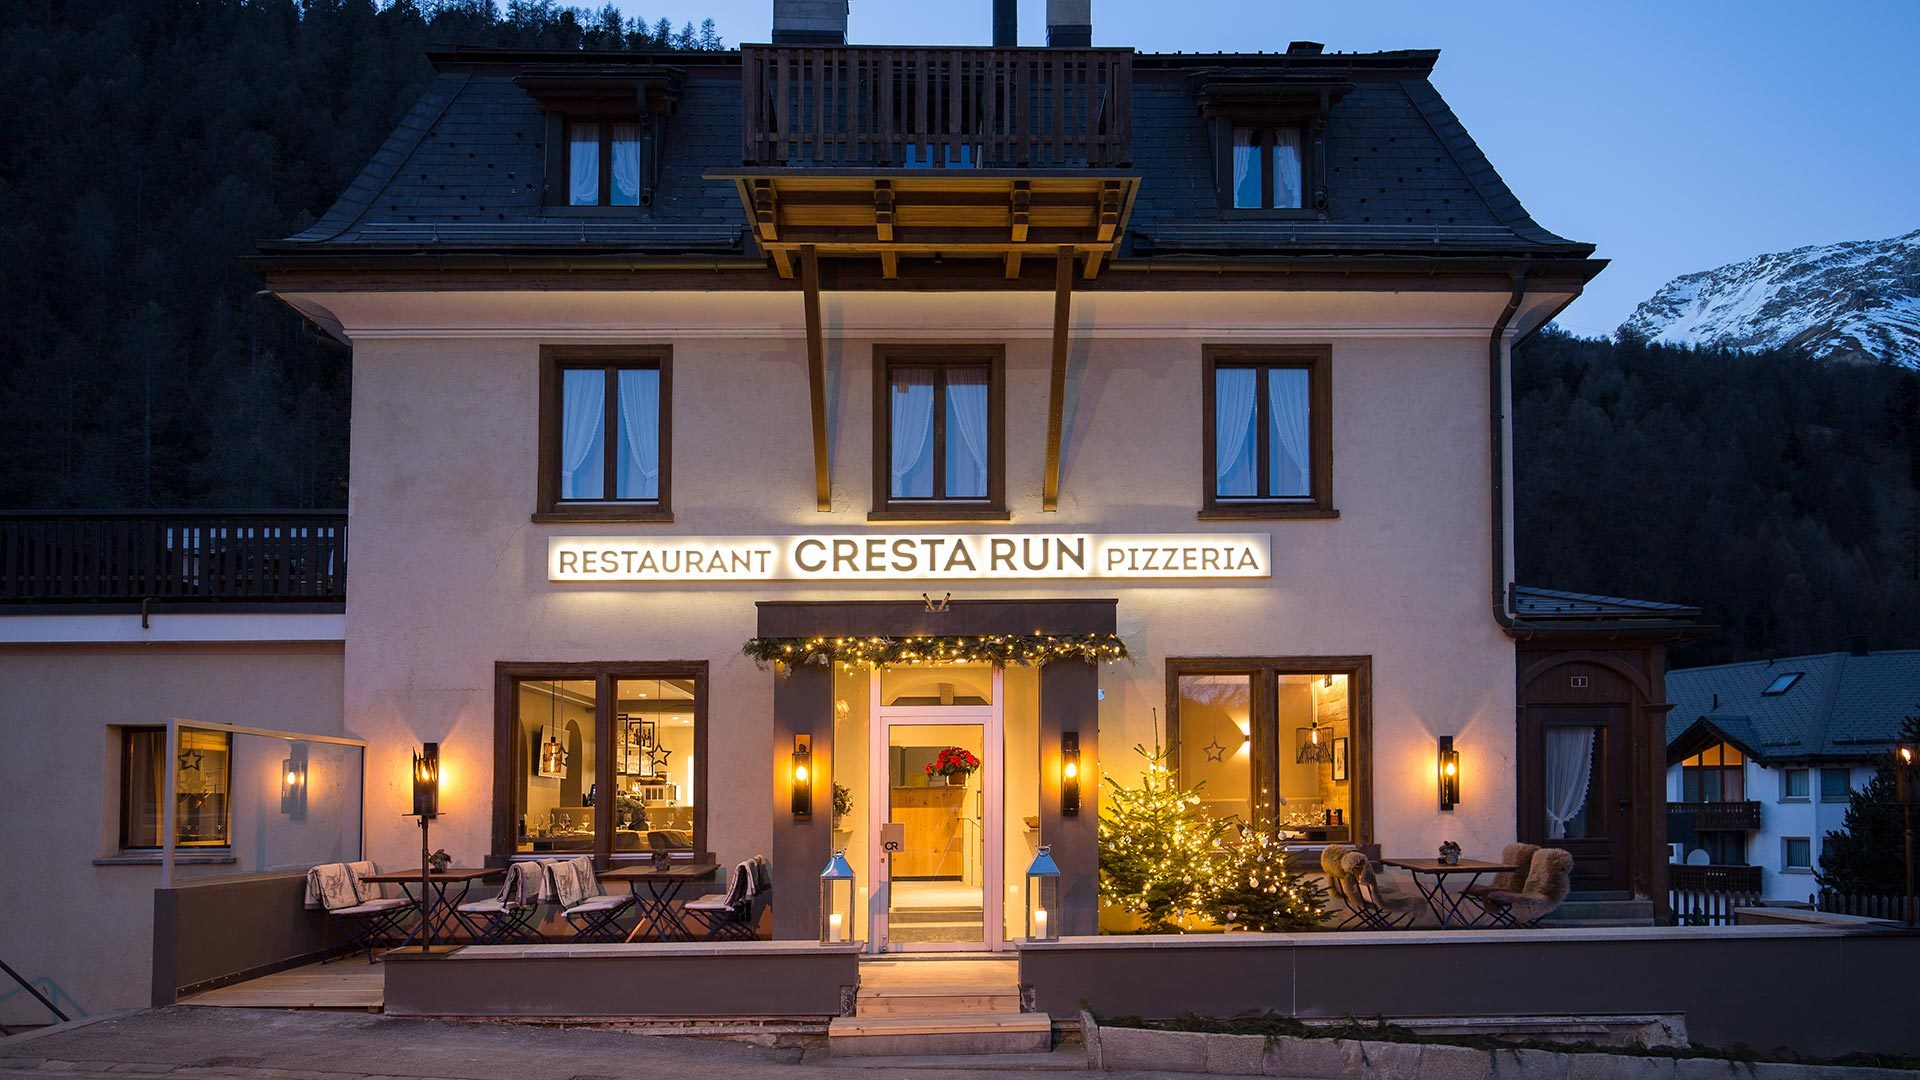 Restaurant Pizzeria Cresta Run Slide 6